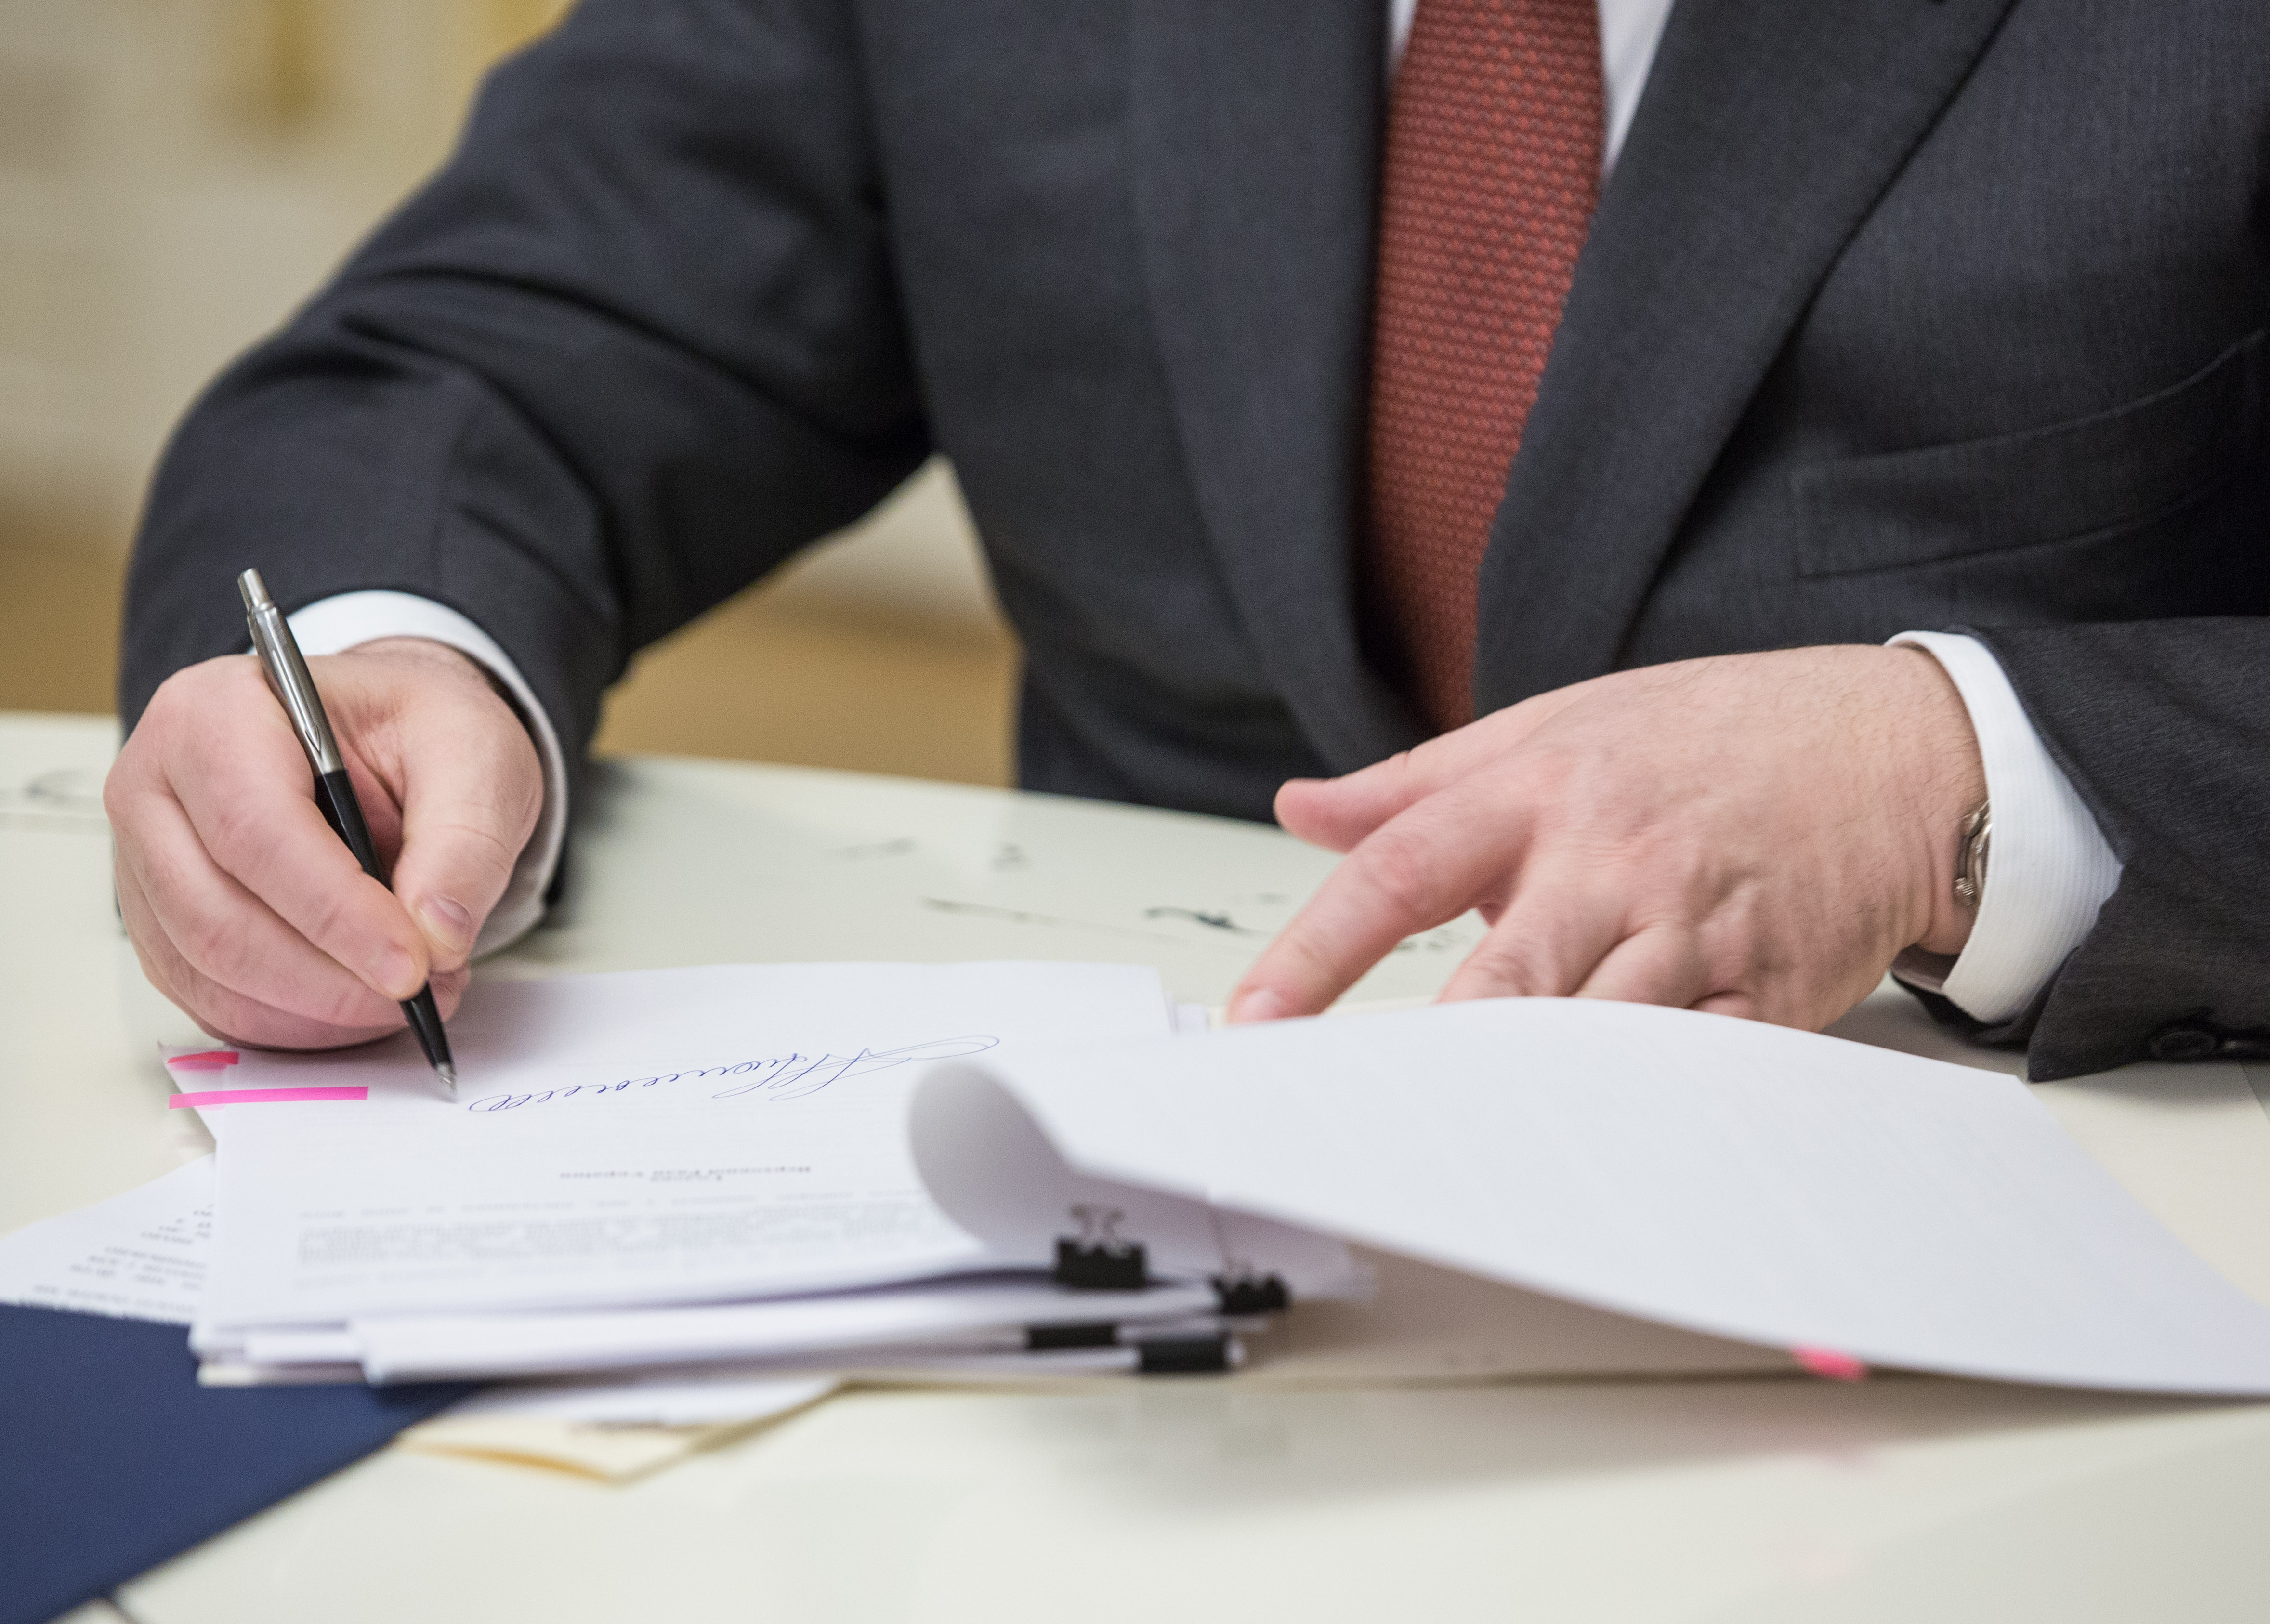 Ščo varto znaty pro zminy v zakonodavstvi vid počatku 2018 roku